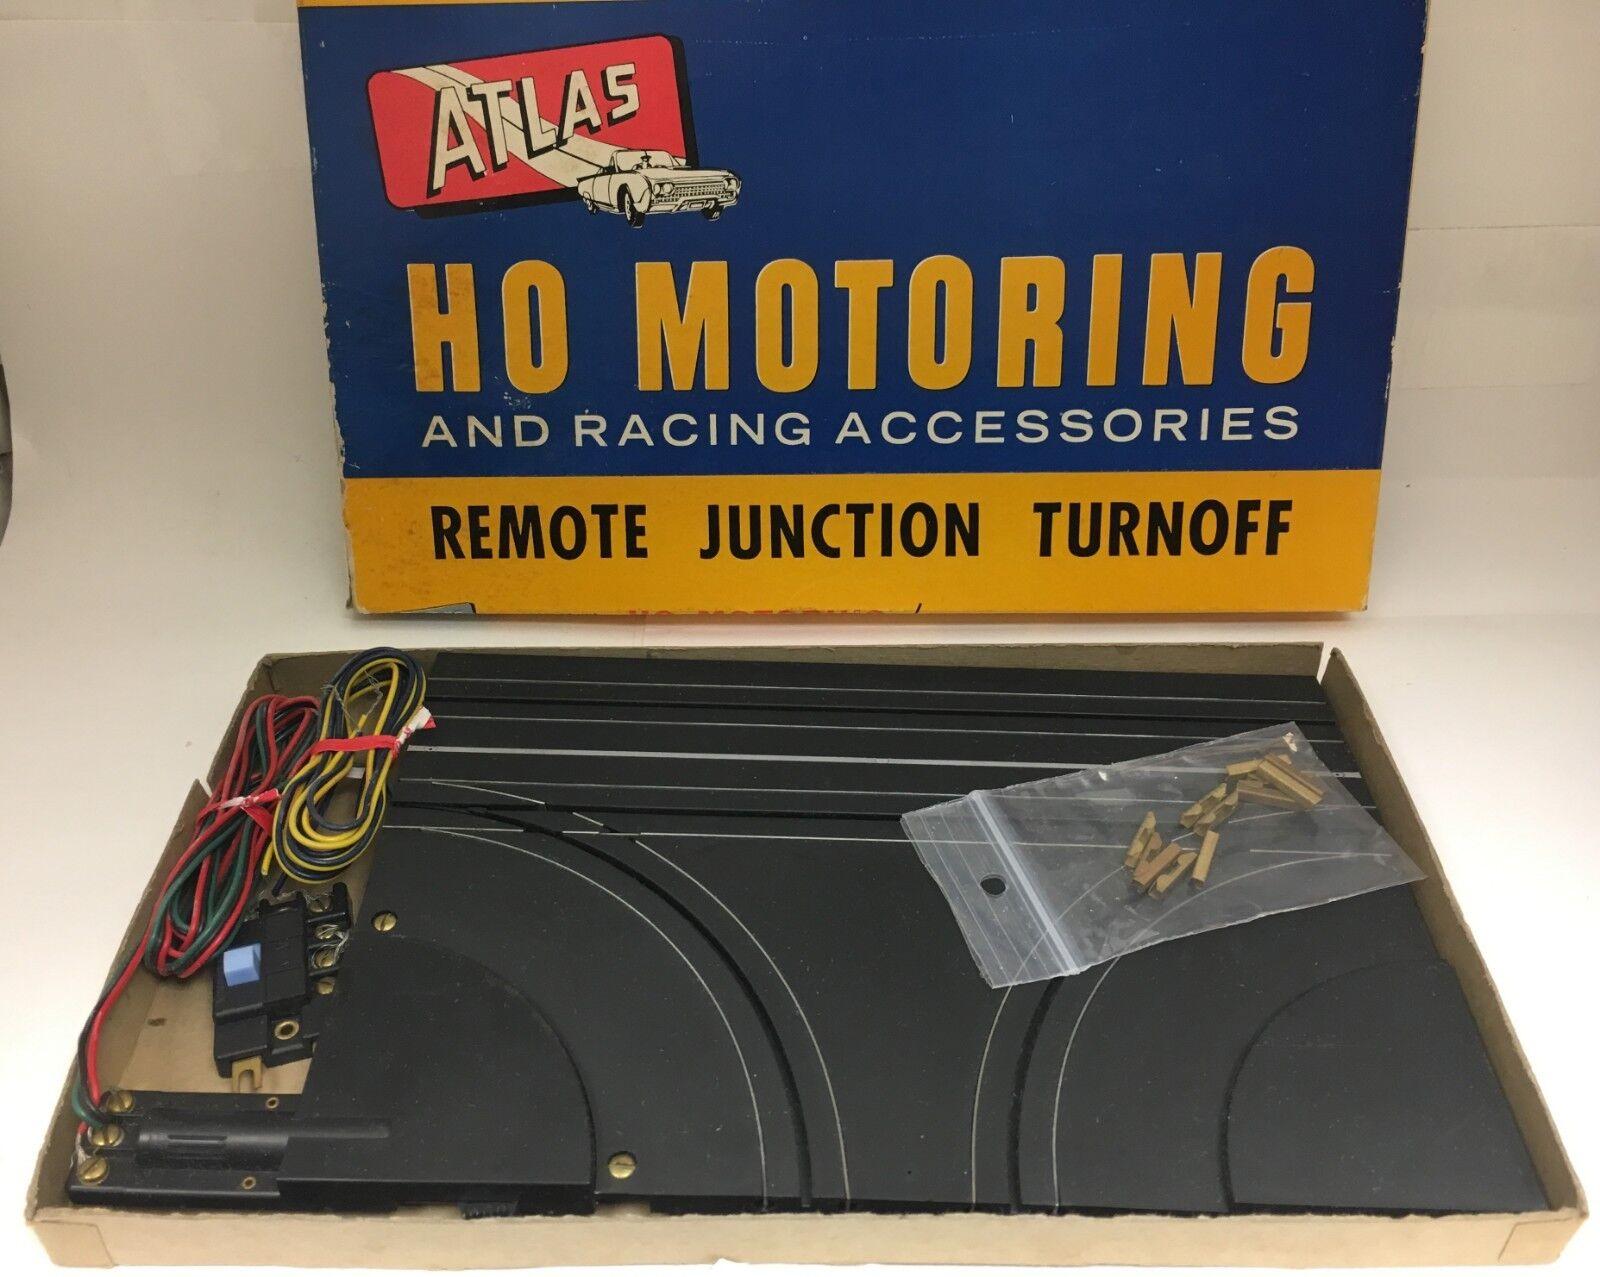 ATLAS HO SLOT CAR 1960'S REMOTE JUNCTION TURNOFF IN ORIGINAL BOX